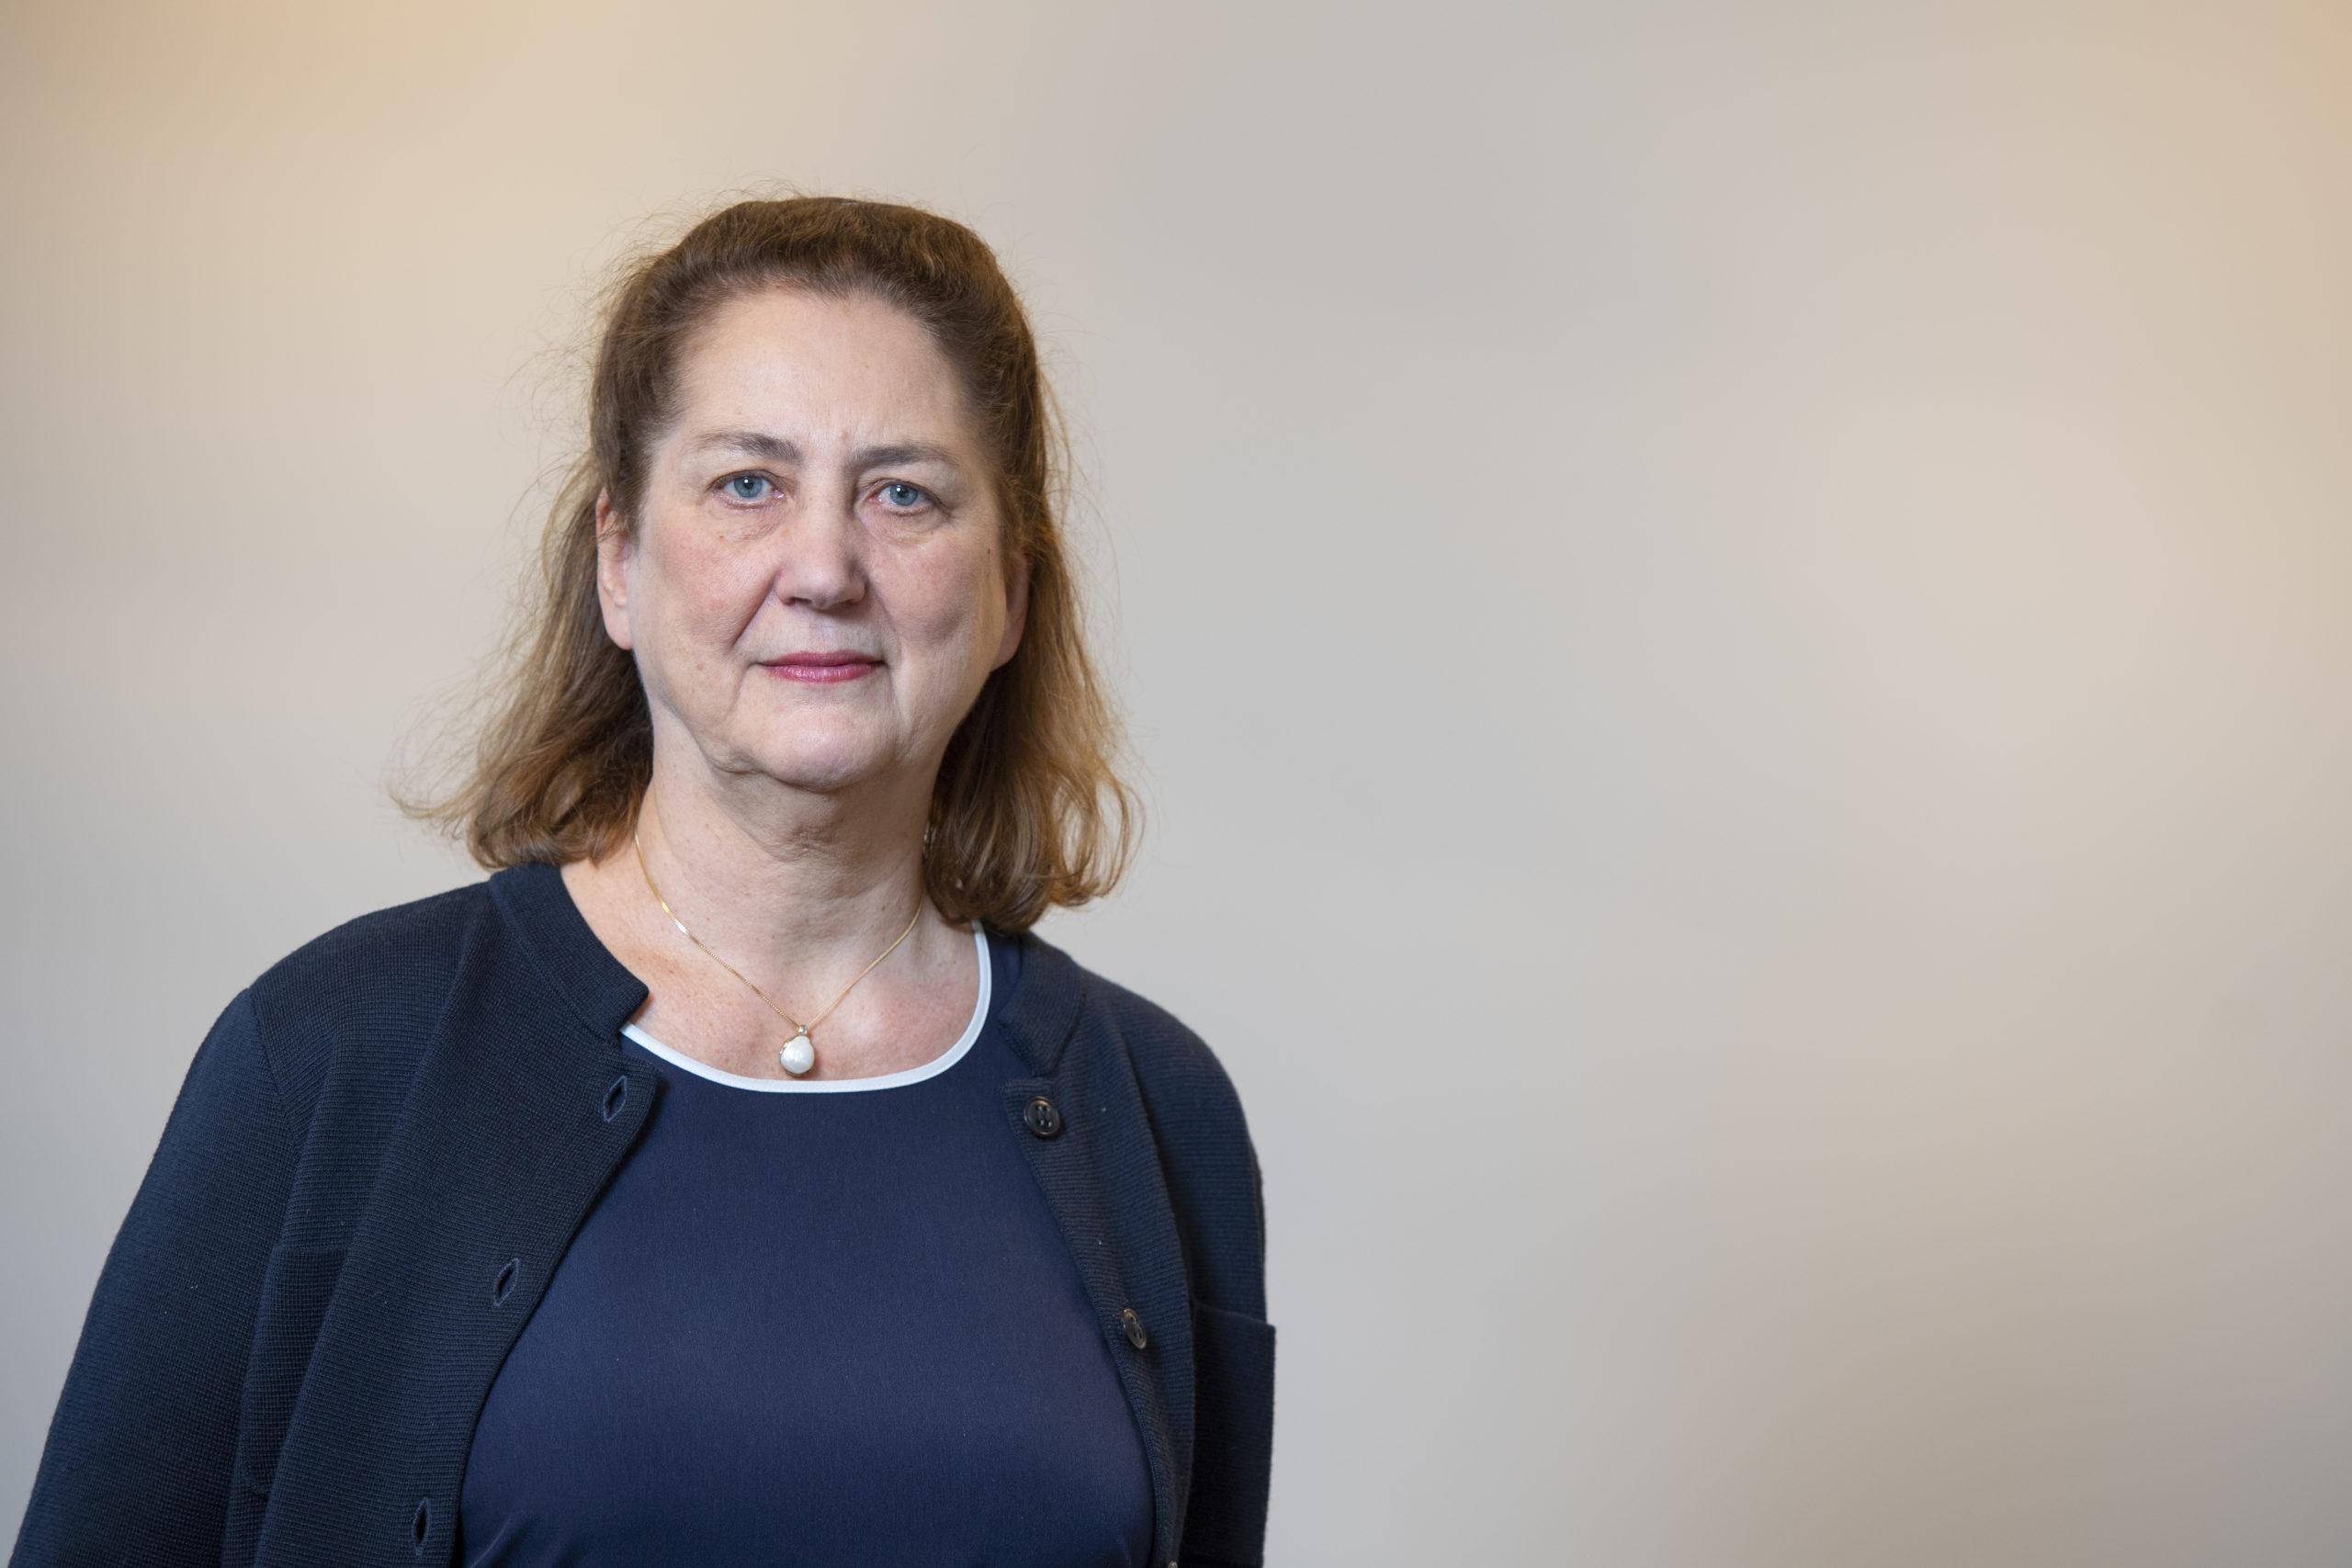 Marie-Louise Hammarström